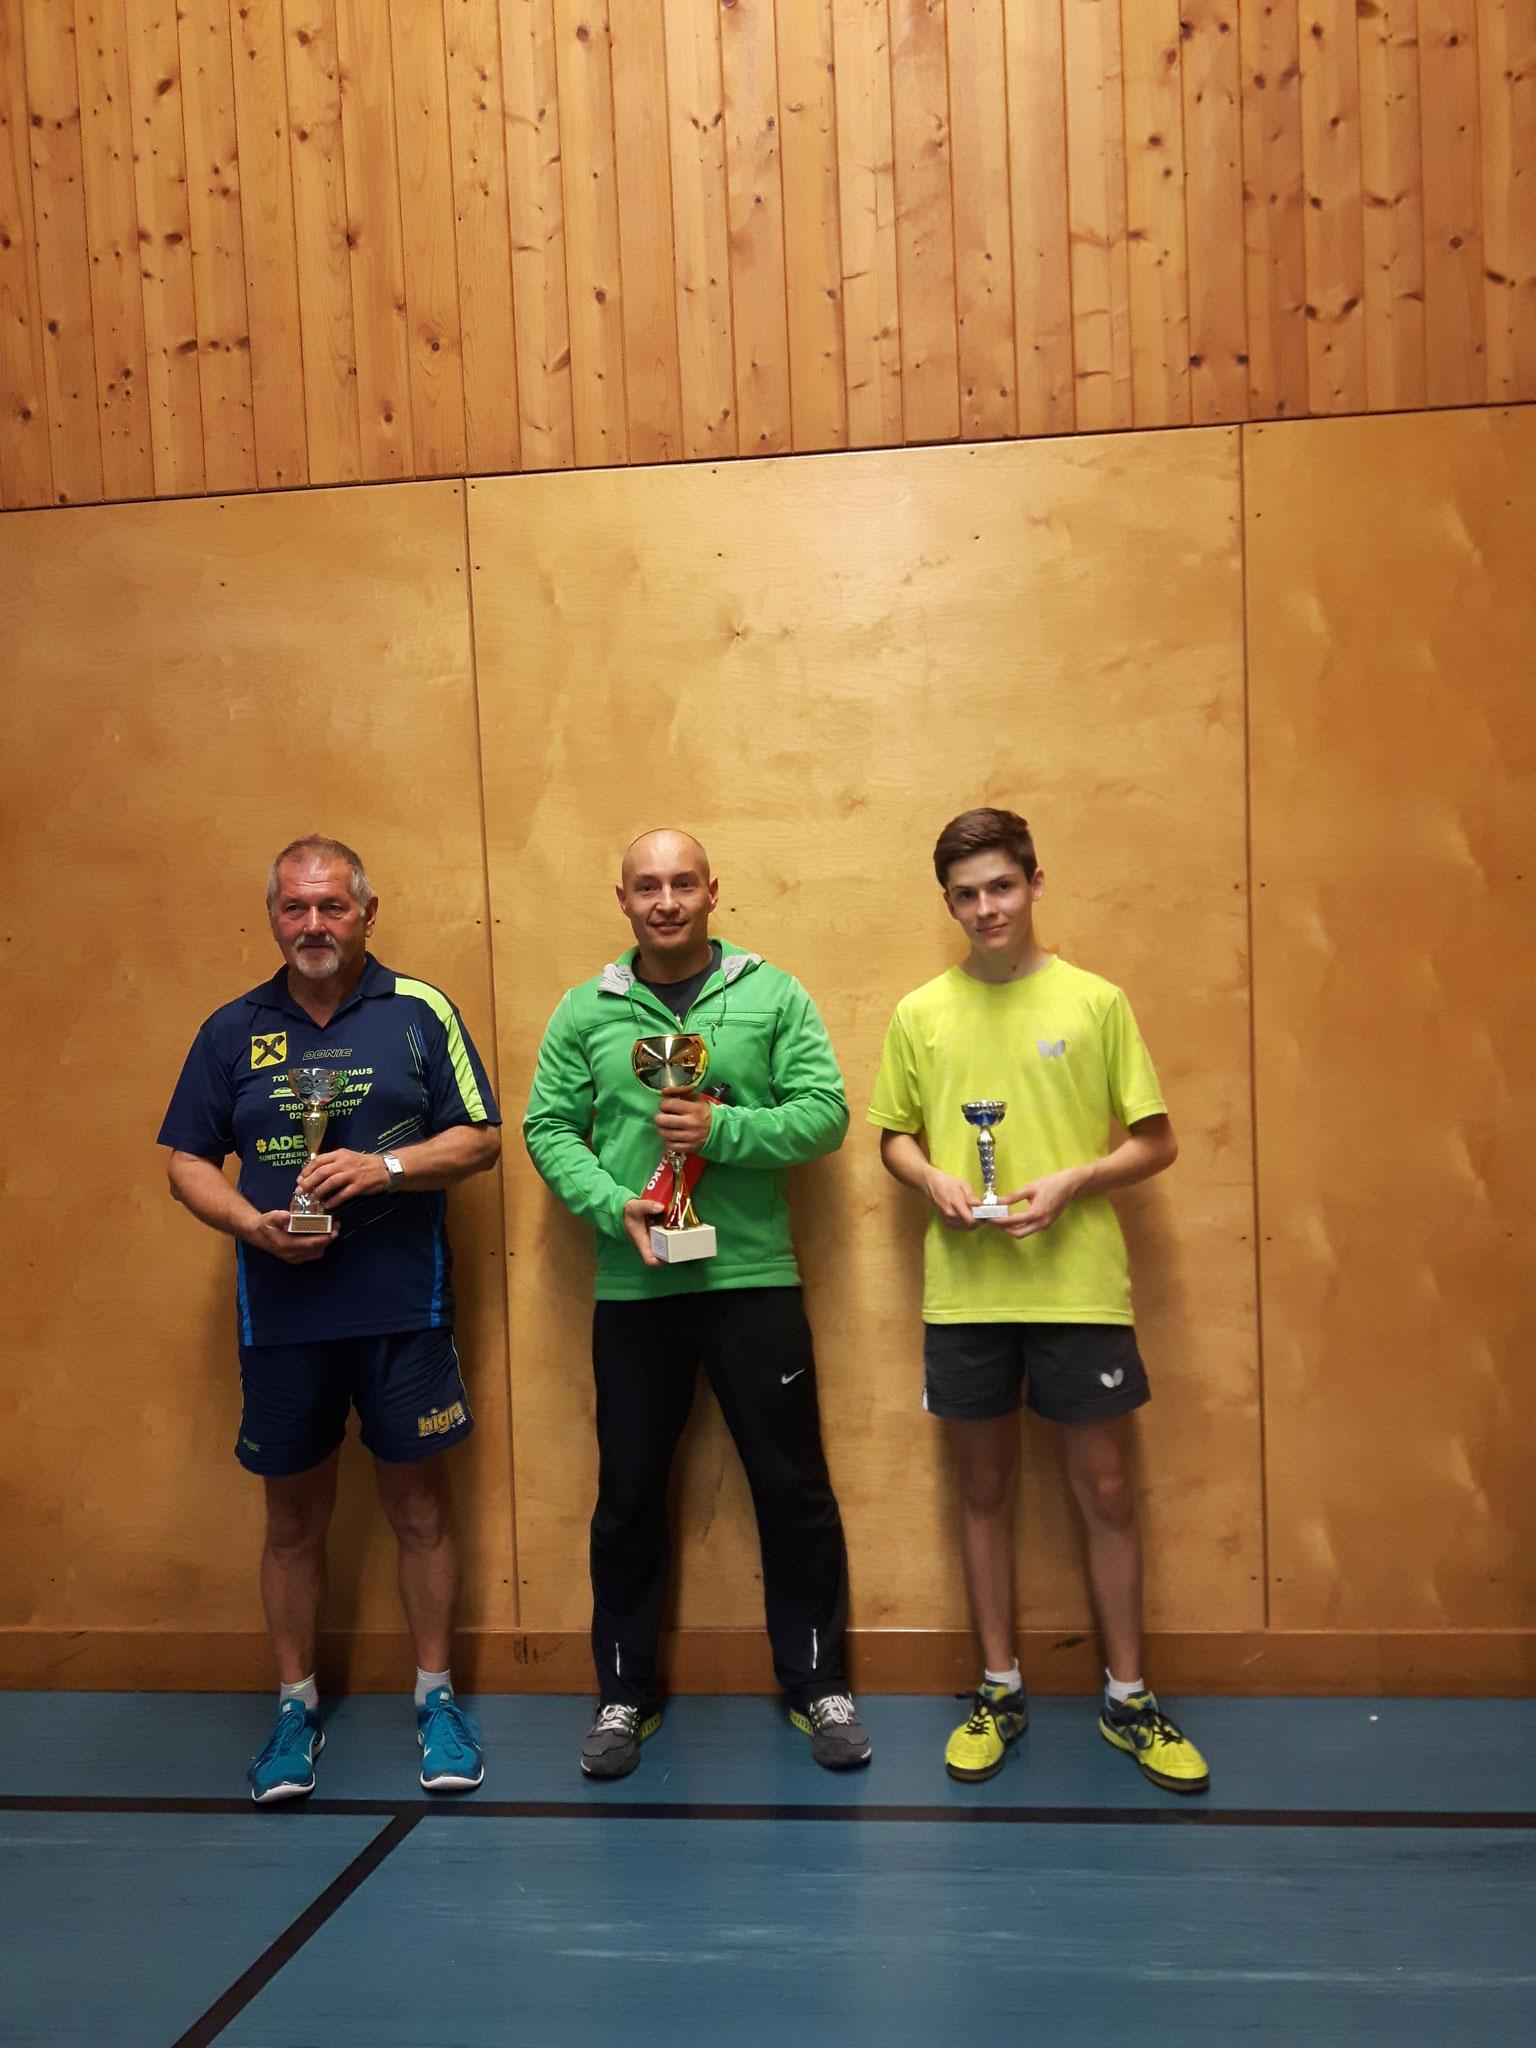 Siegerfoto Bewerb B: v.l.n.r. Karl Grabenweger (KAUM) (Platz 2), Marcin Gibala (WPAE) (Sieger), David Brandl (SSTO) (Platz 3)